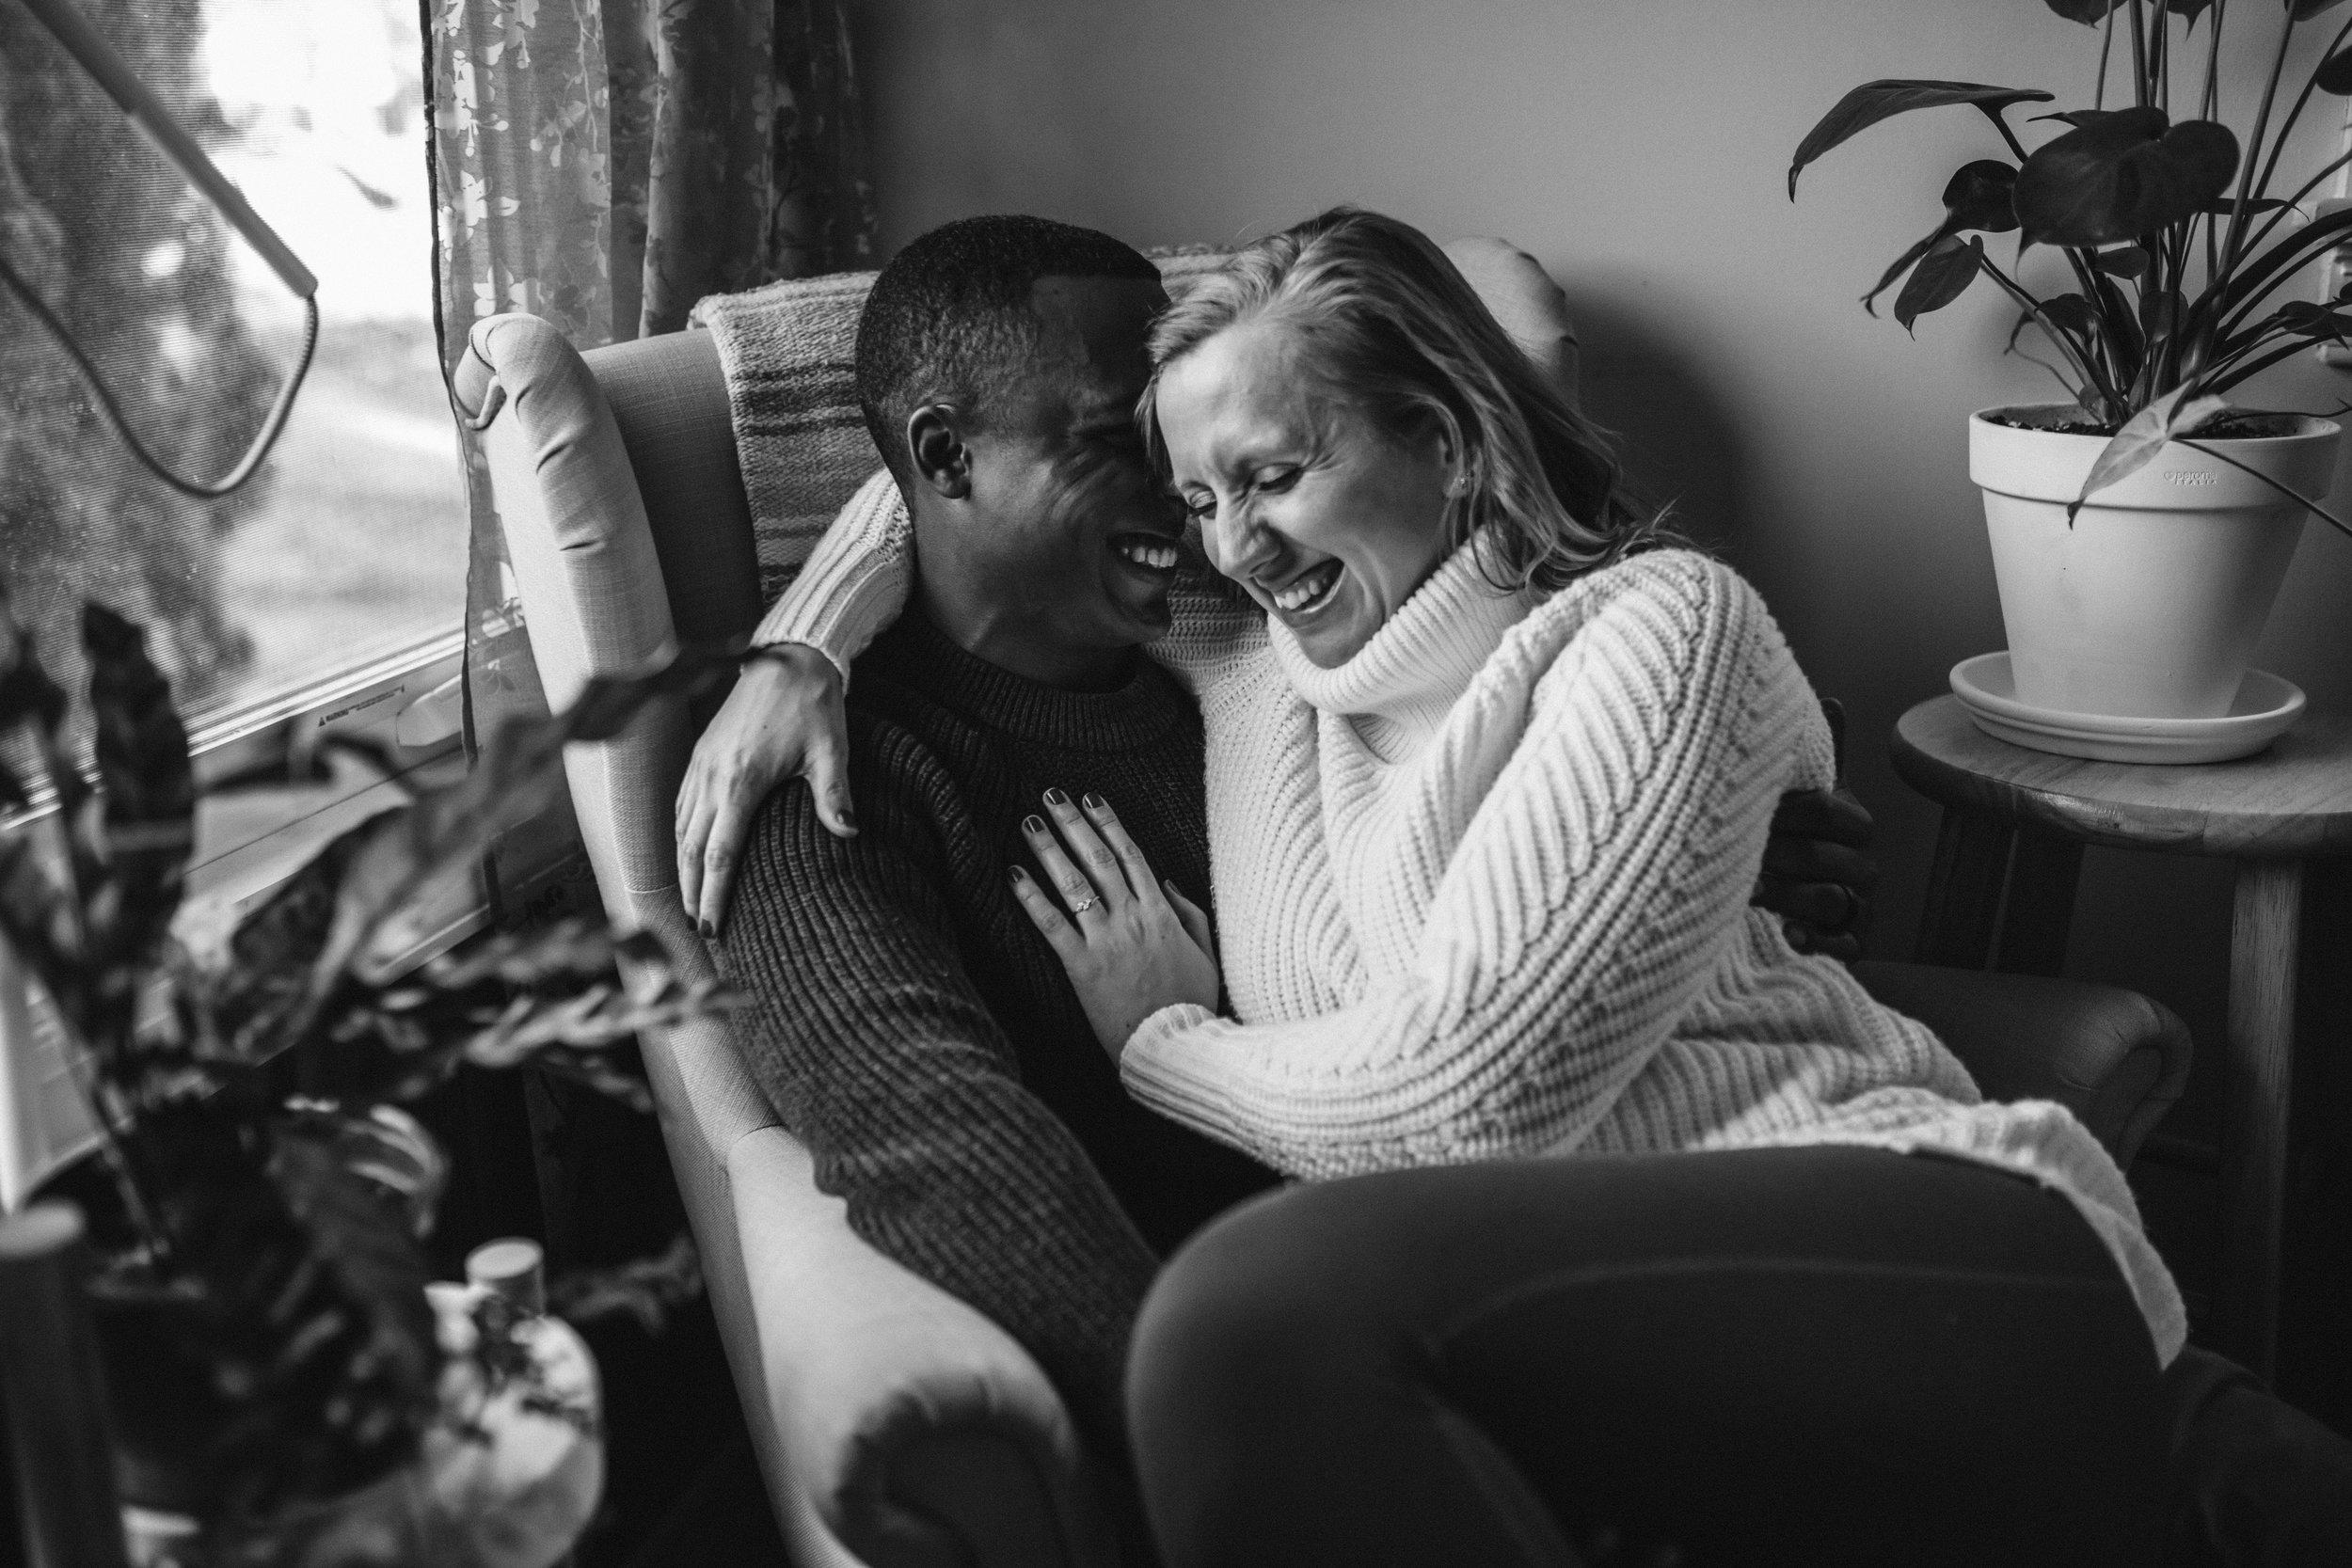 rebeccaburtphotography.DorotaandDwight.Engagementsession.RichmondVirginia-8.JPG